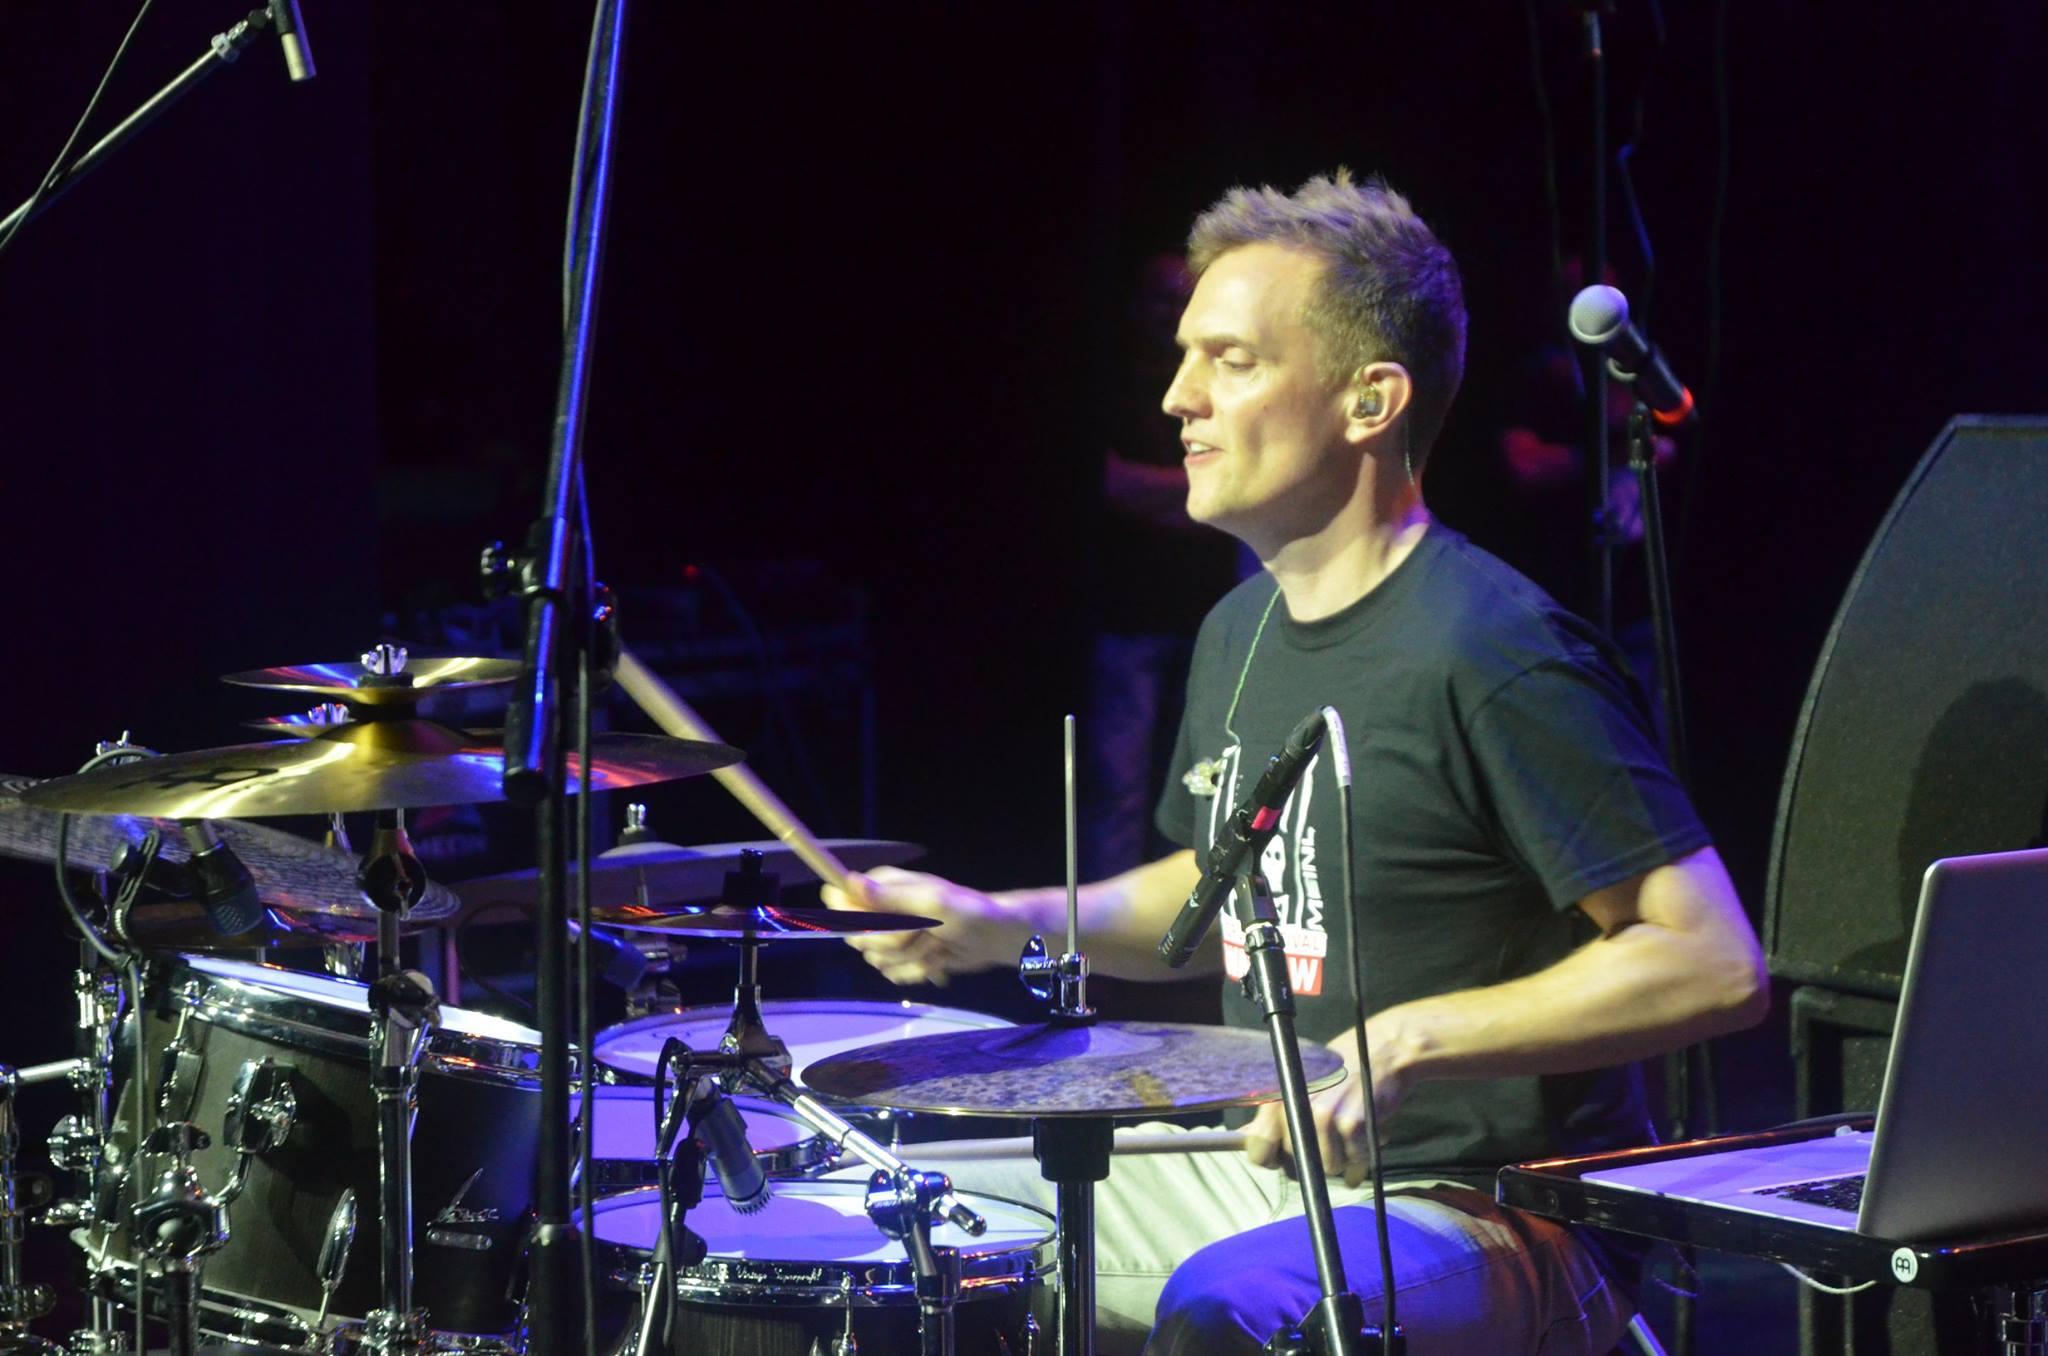 Meinl Drum Festival 2016: Jost Nickel